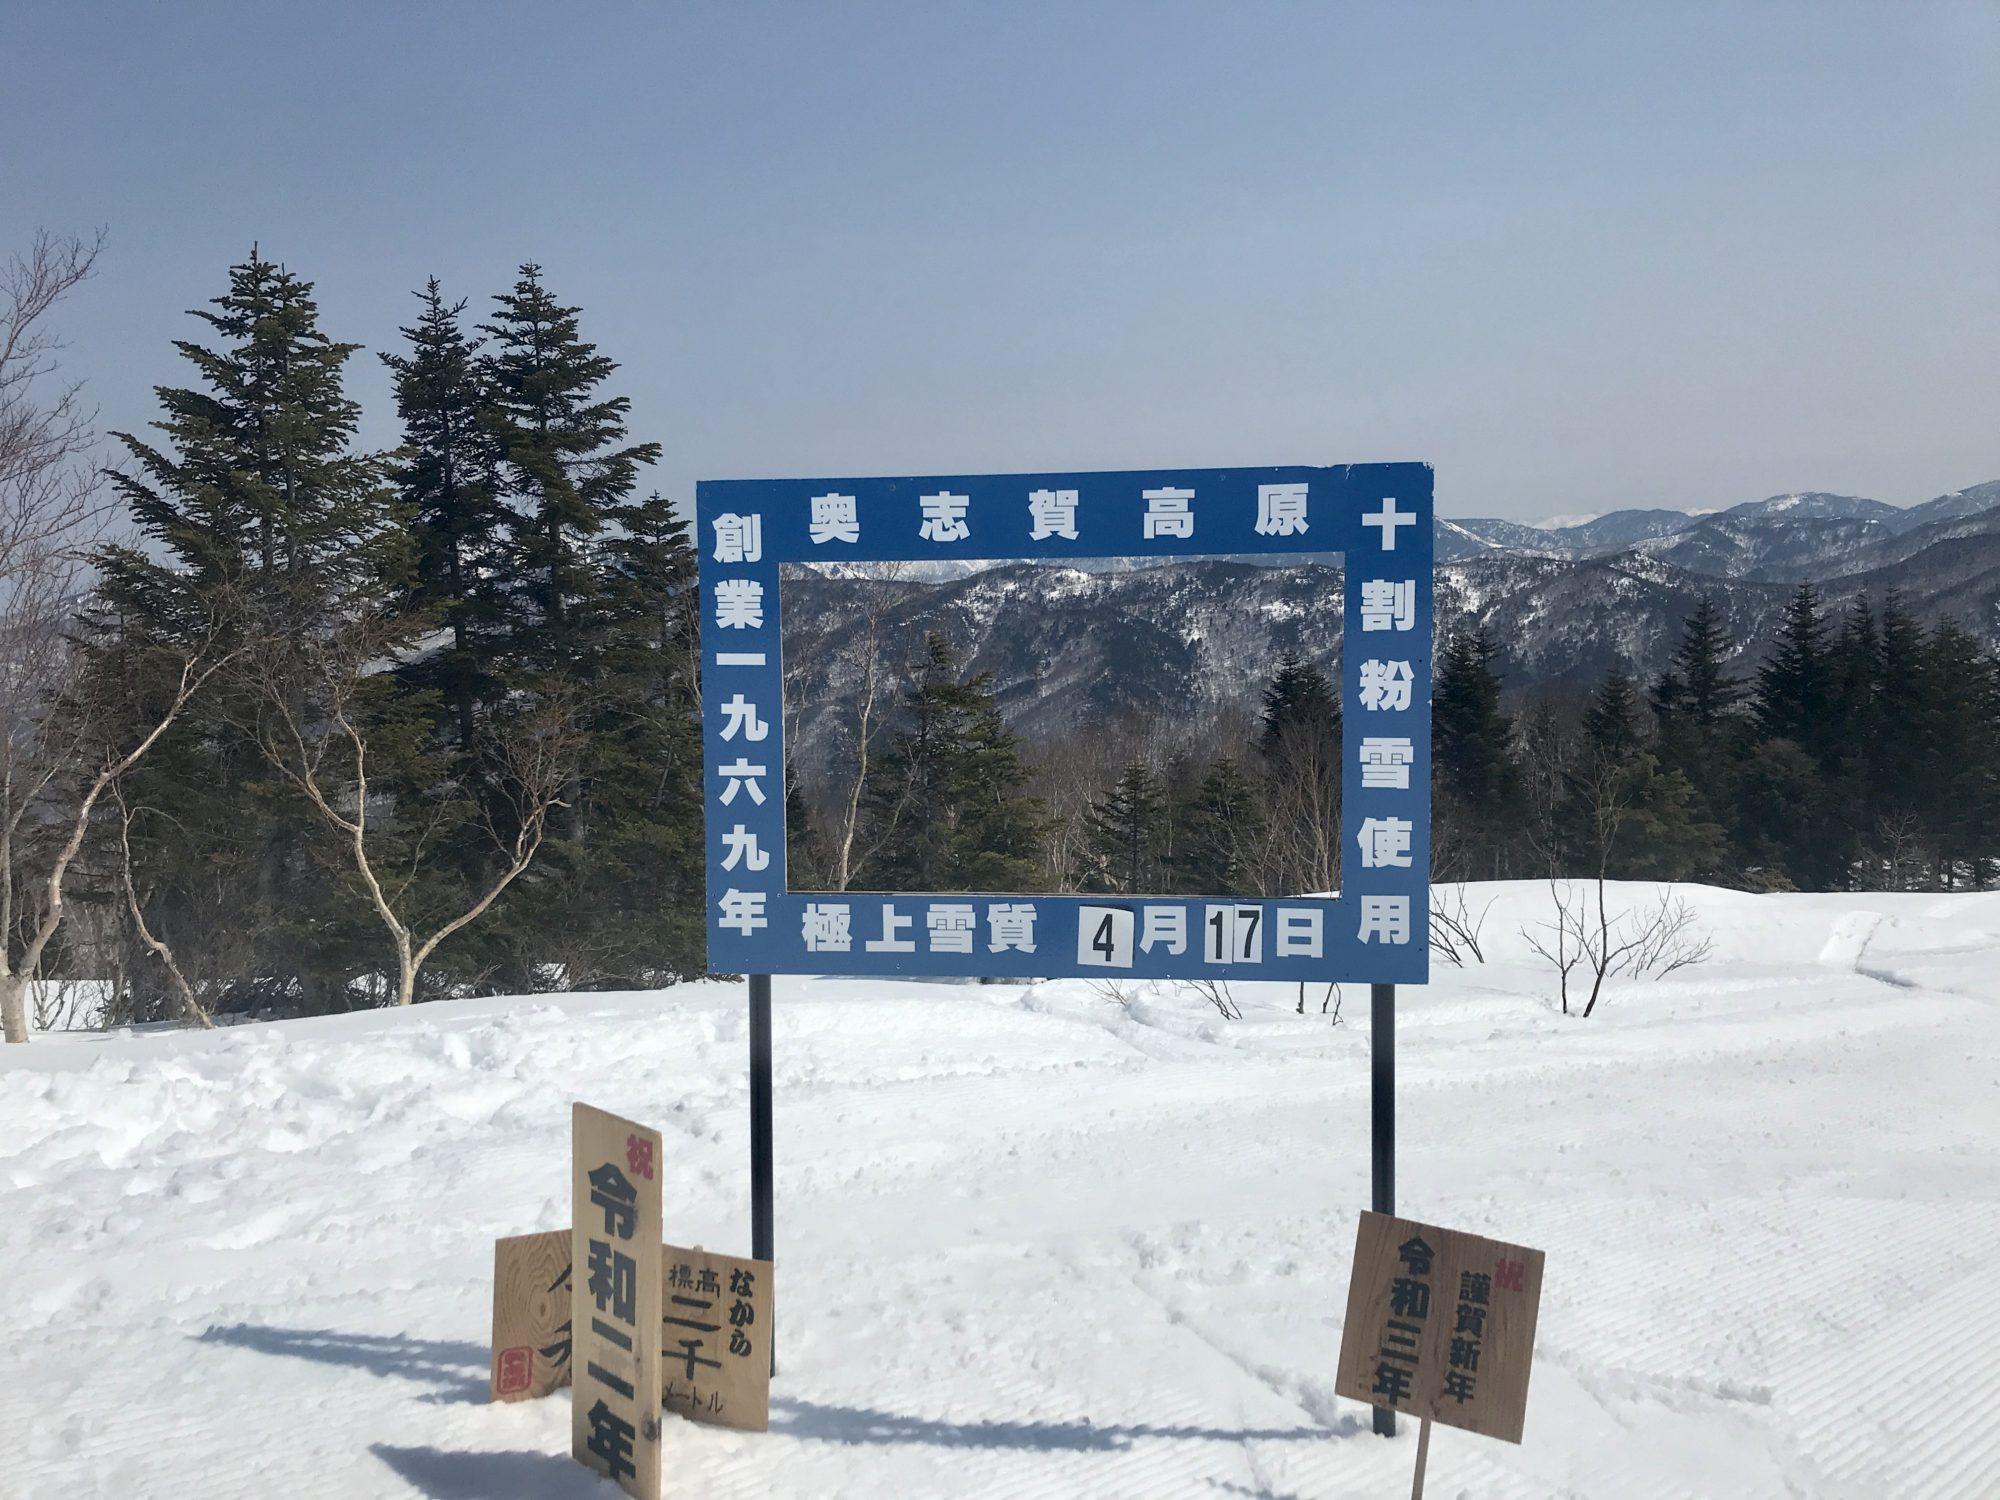 2020 Apr at okushiga ski area